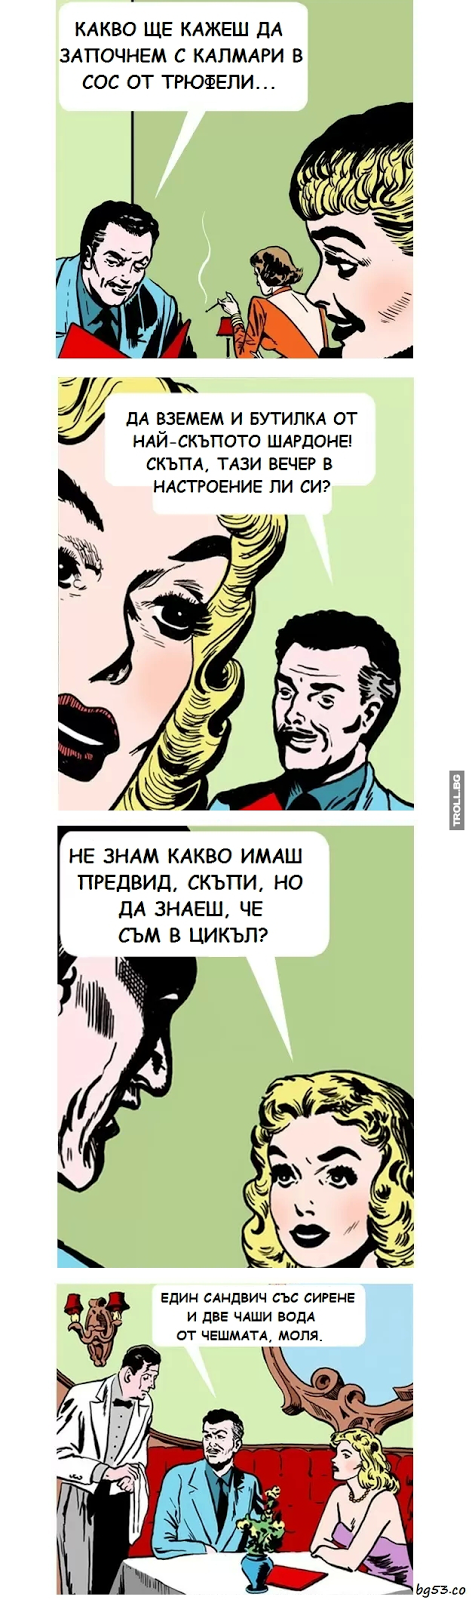 [Изображение: kompilaciq-10-smeshni-komiksi-kartinki-n...imka-7.jpg]